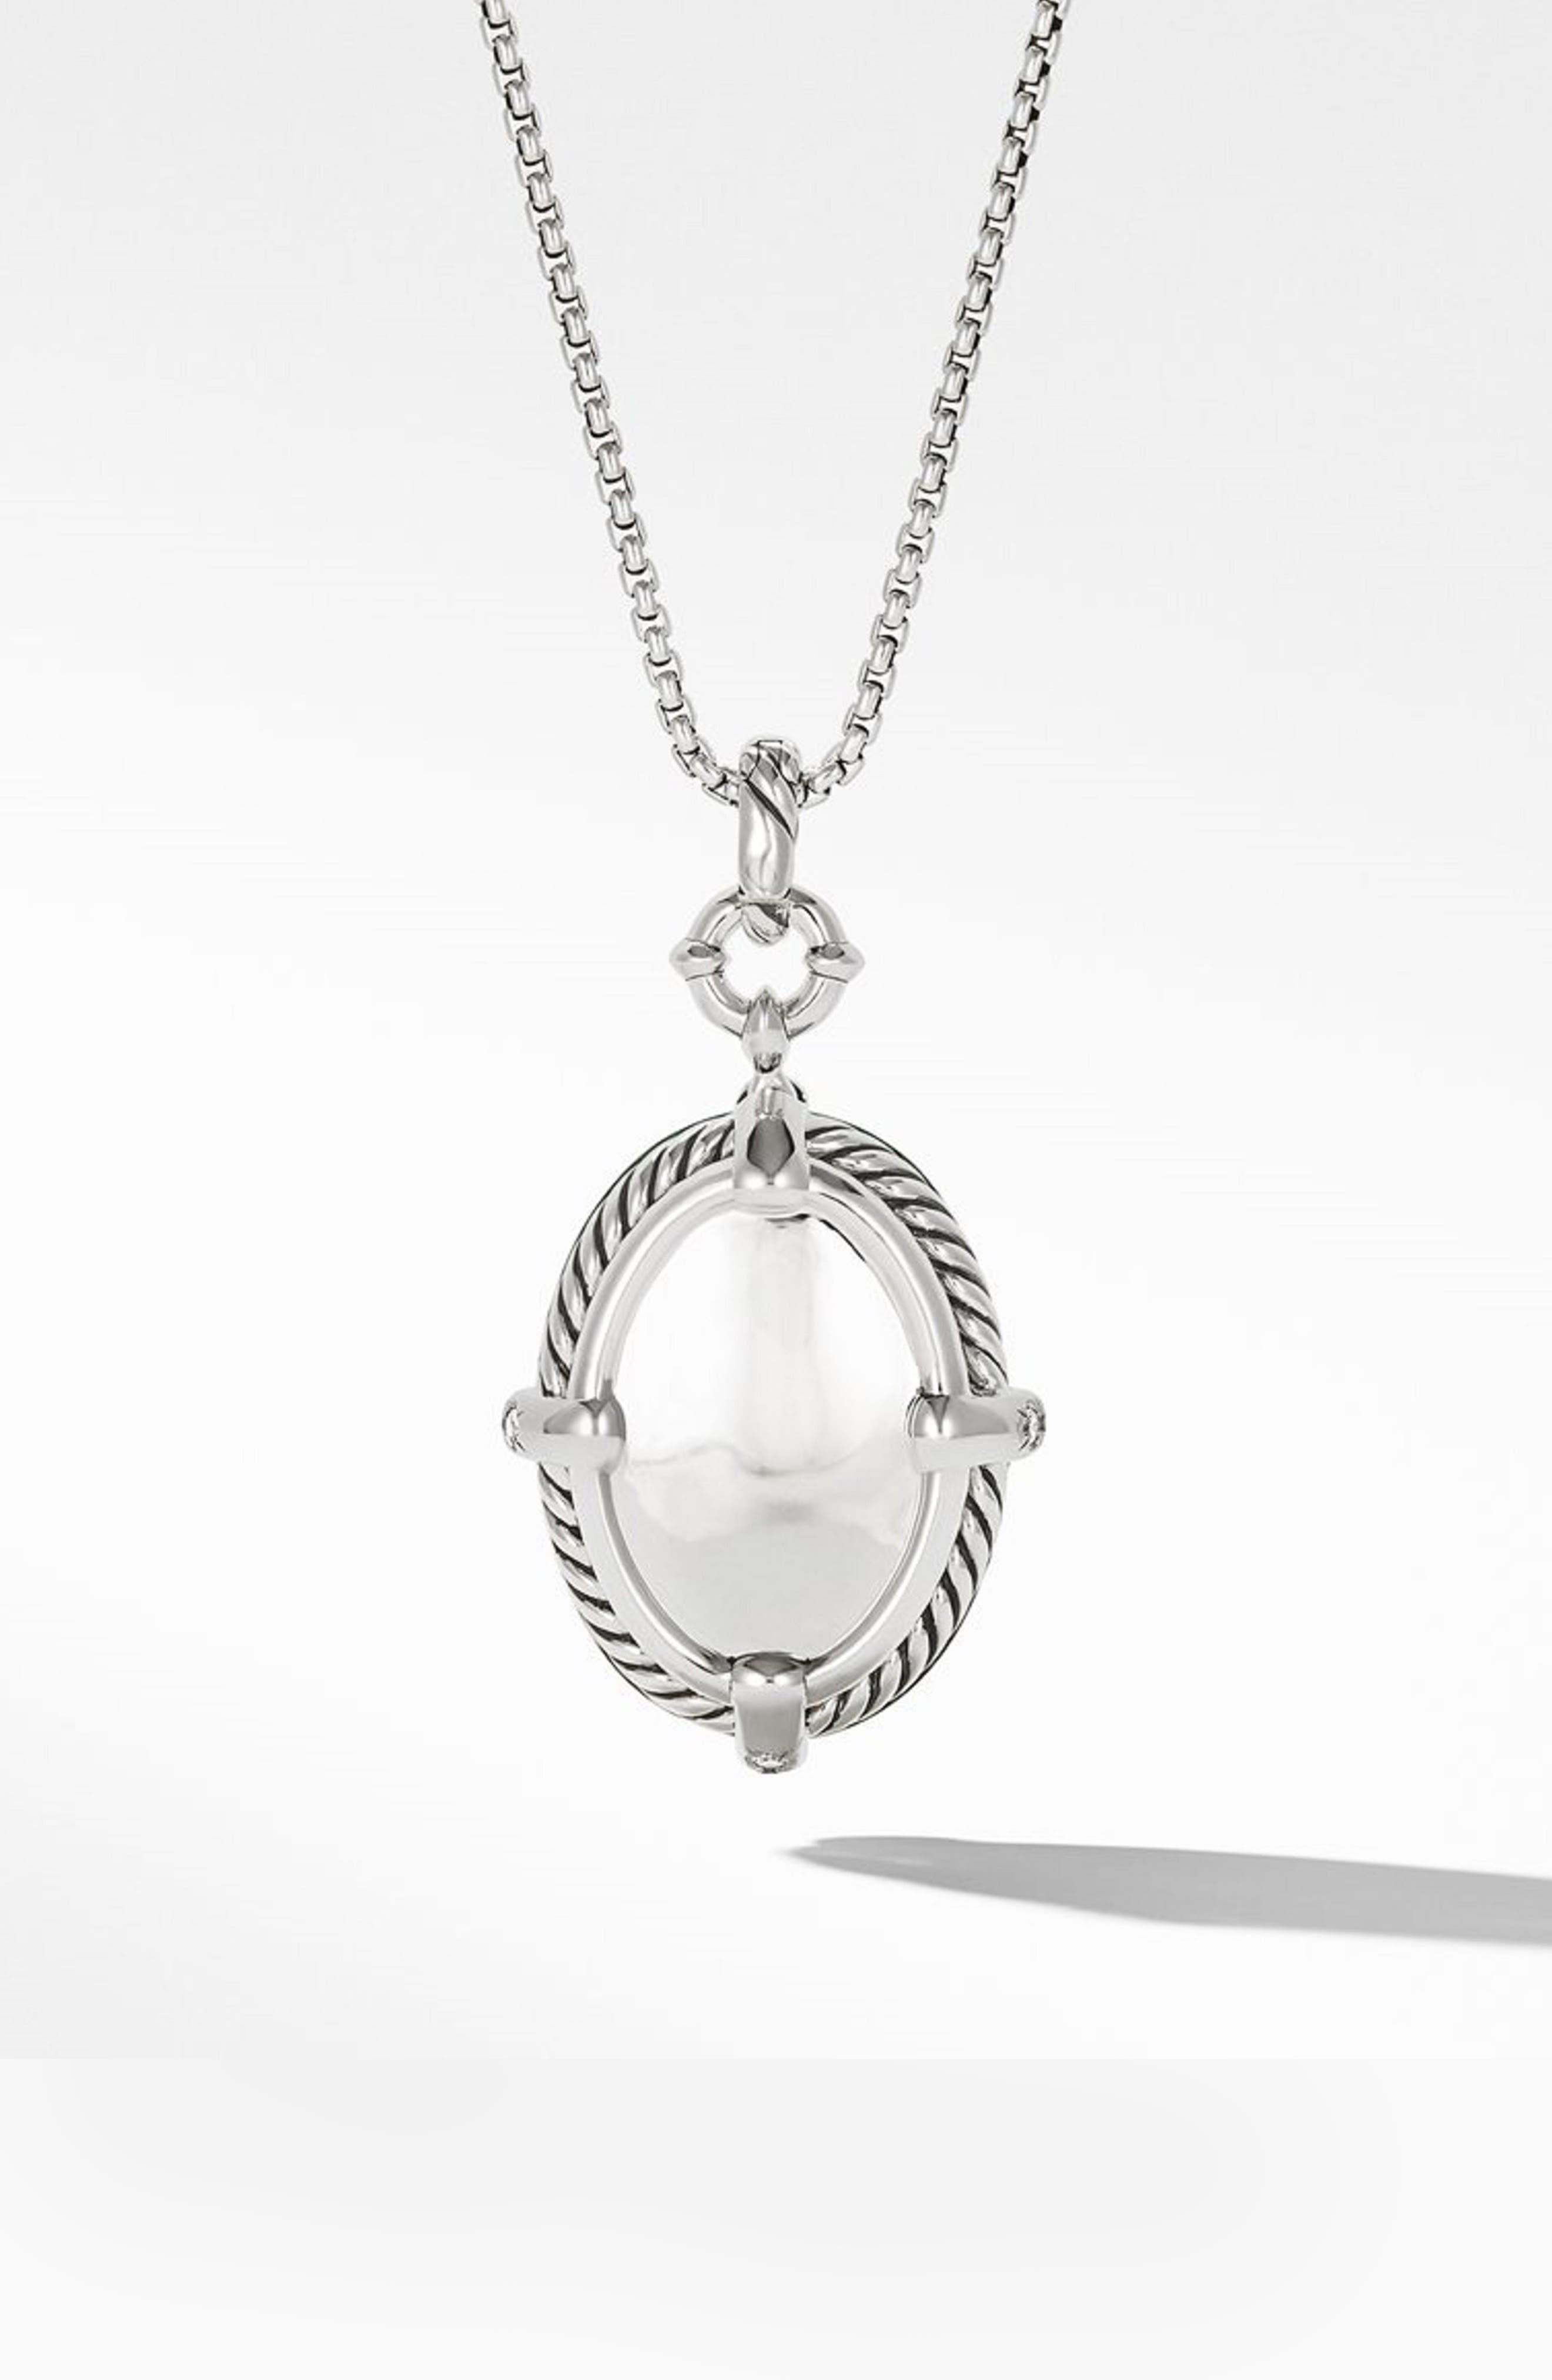 DAVID YURMAN,                             Statement Prasiolite Pendant Necklace with Diamonds,                             Alternate thumbnail 3, color,                             SILVER/ DIAMOND/ PRASIOLITE